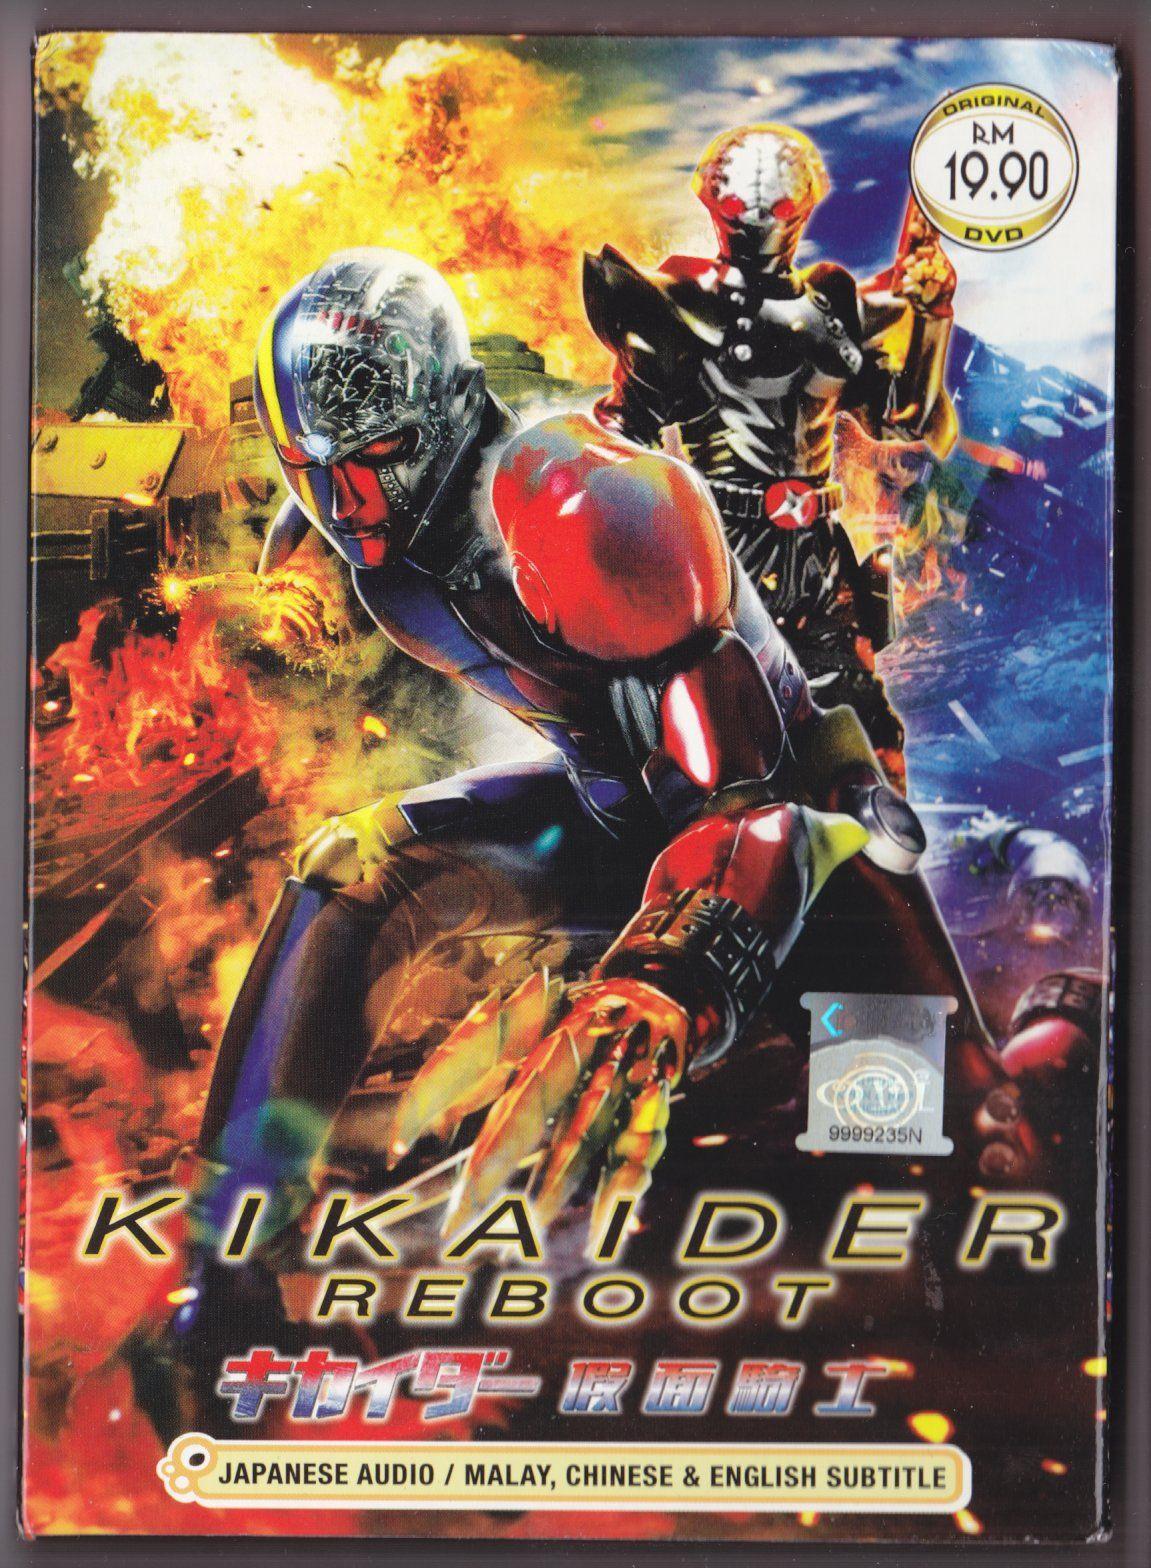 GEEK BROLL Tokusatsu Review Kikaider Reboot Show